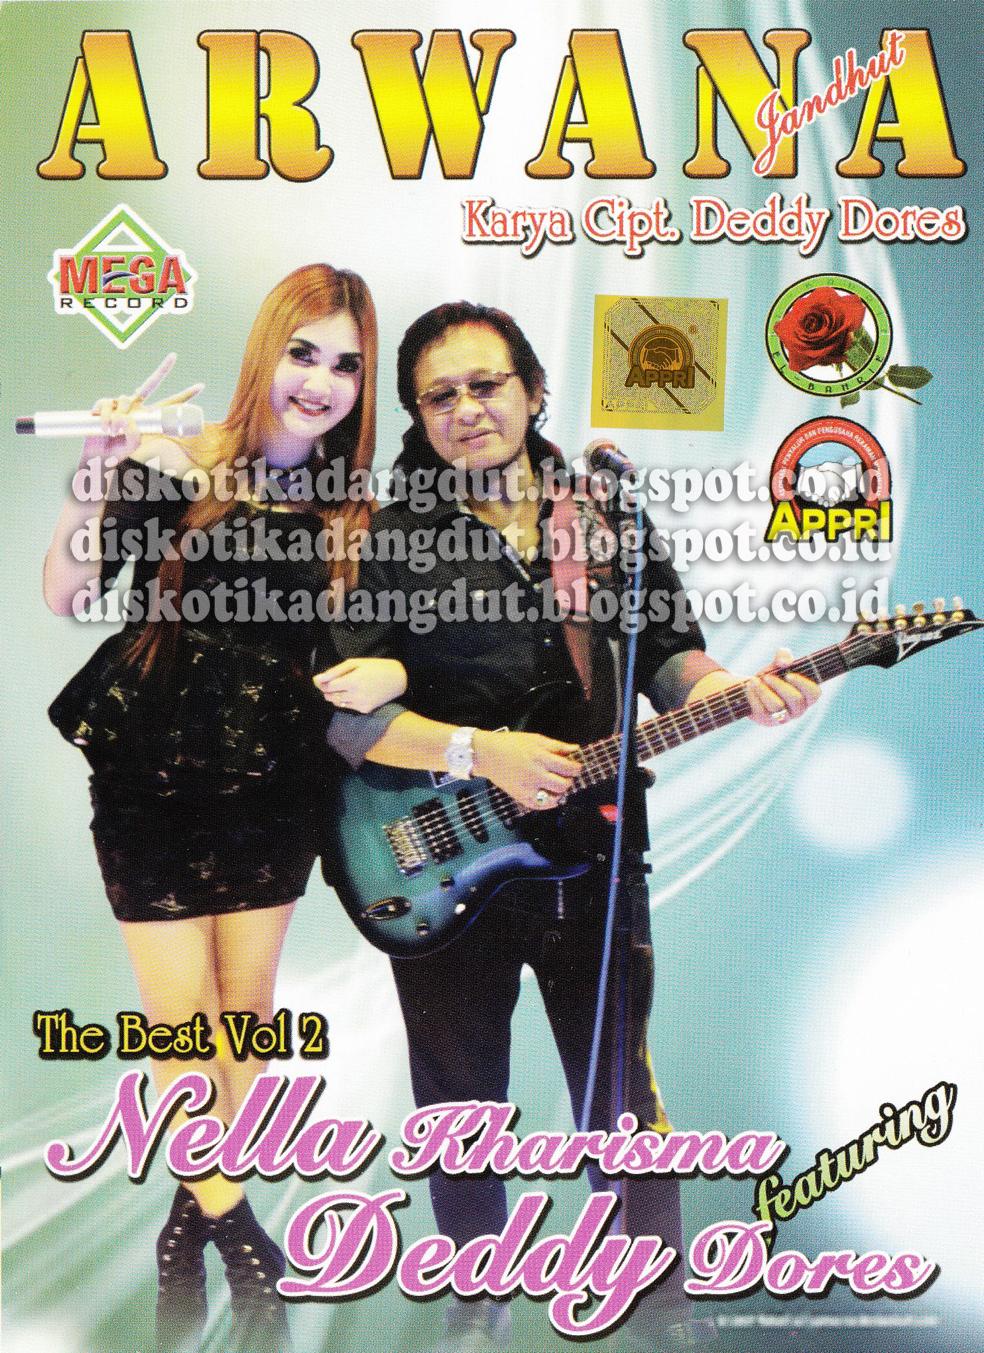 showing 1st image of Deddy Dores Cinta Diantara Kita Arwana Best Nella Kharisma feat Deddy Dores 2016 ...